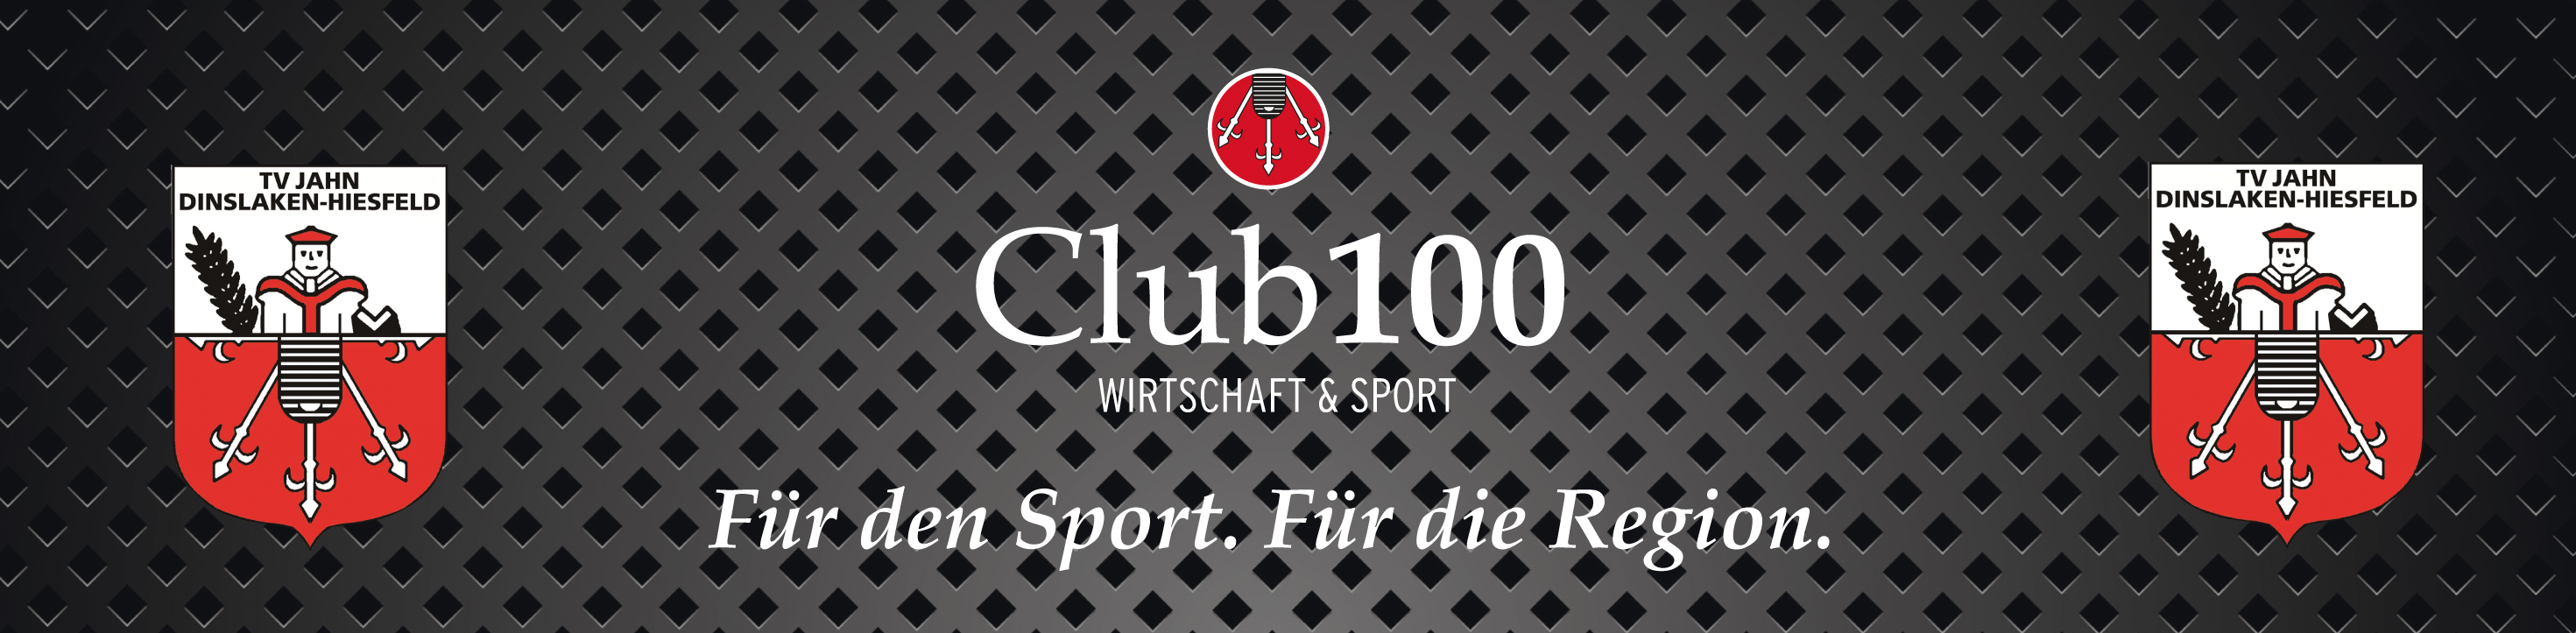 banner_club100_s